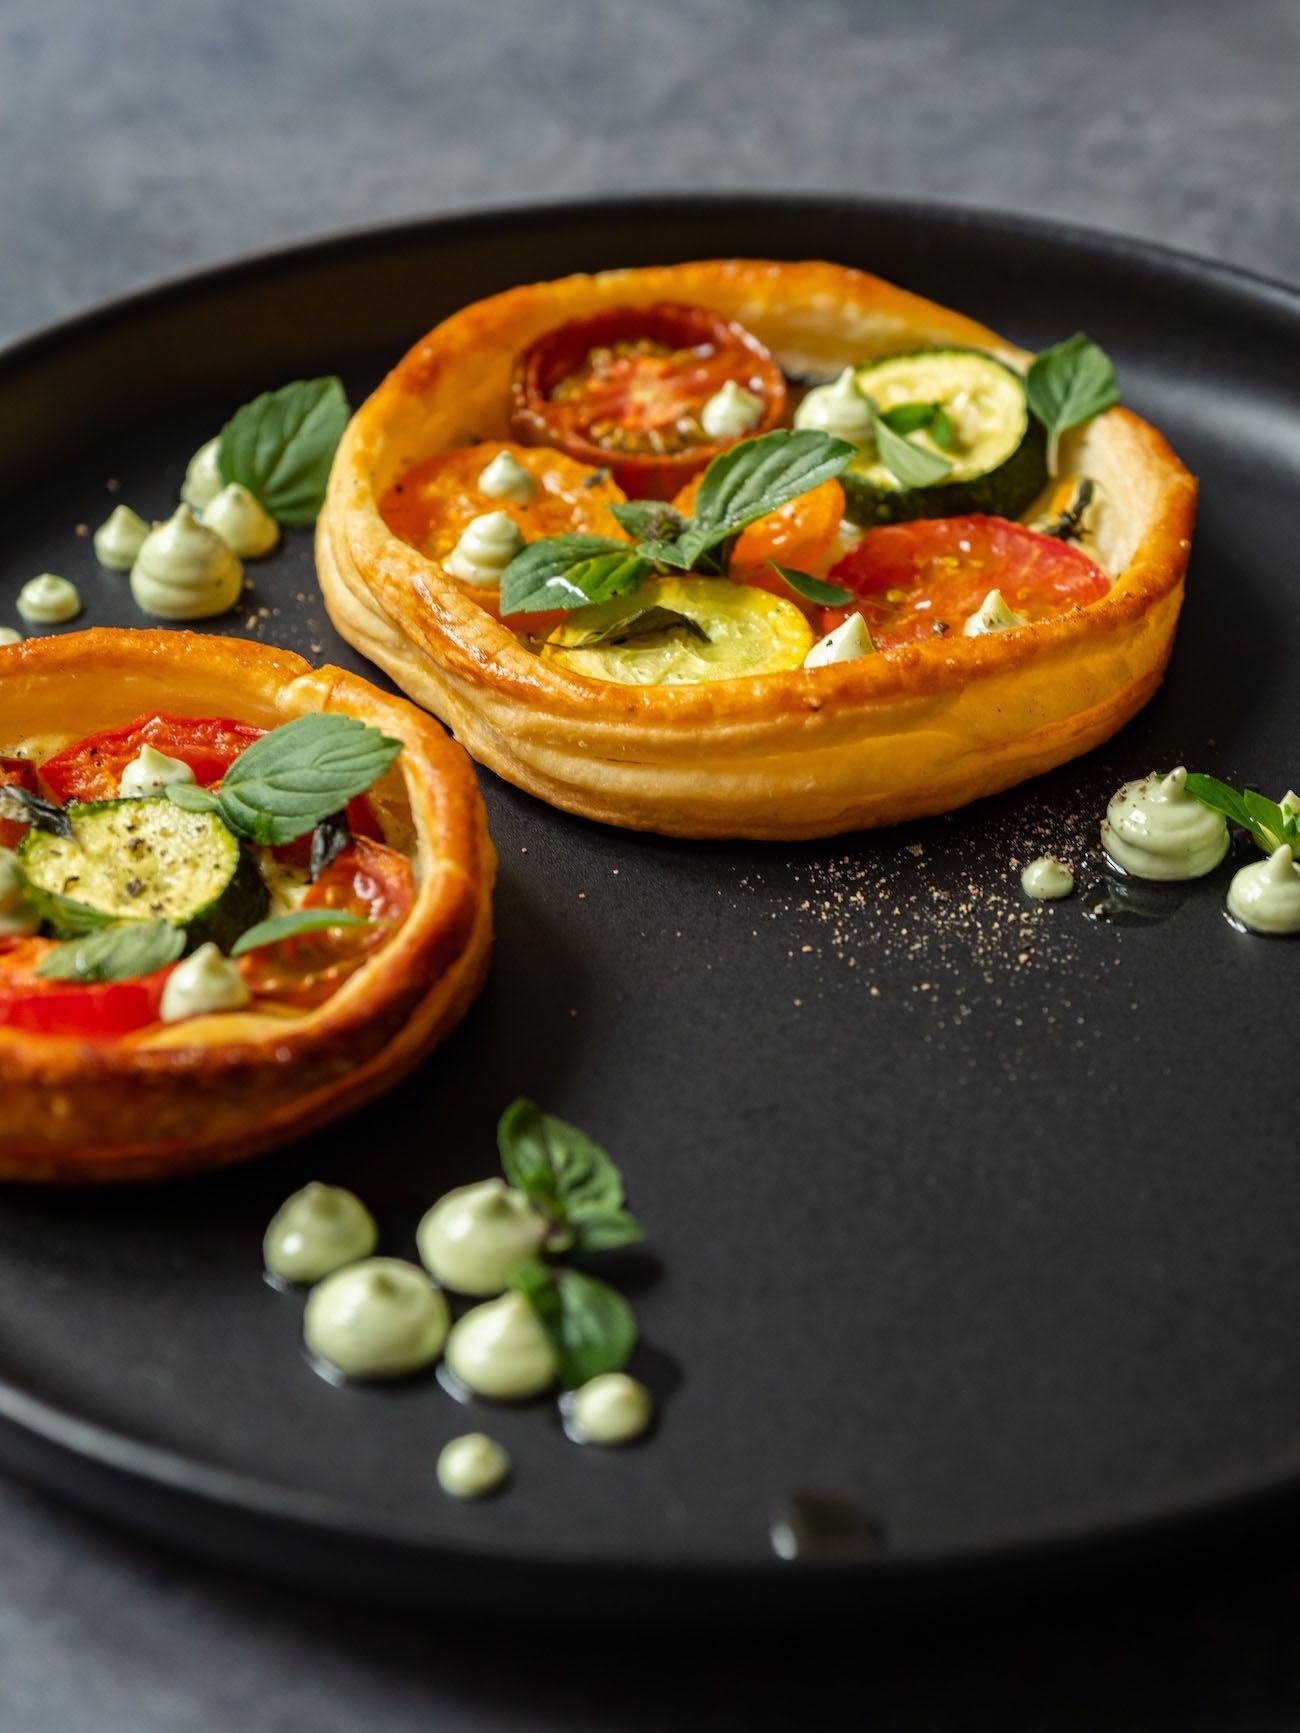 Rezept, Foodblog, About Fuel, Tomaten Zucchini Tartelettes mit Basilikum Feta Creme, Pfeffer, Teller